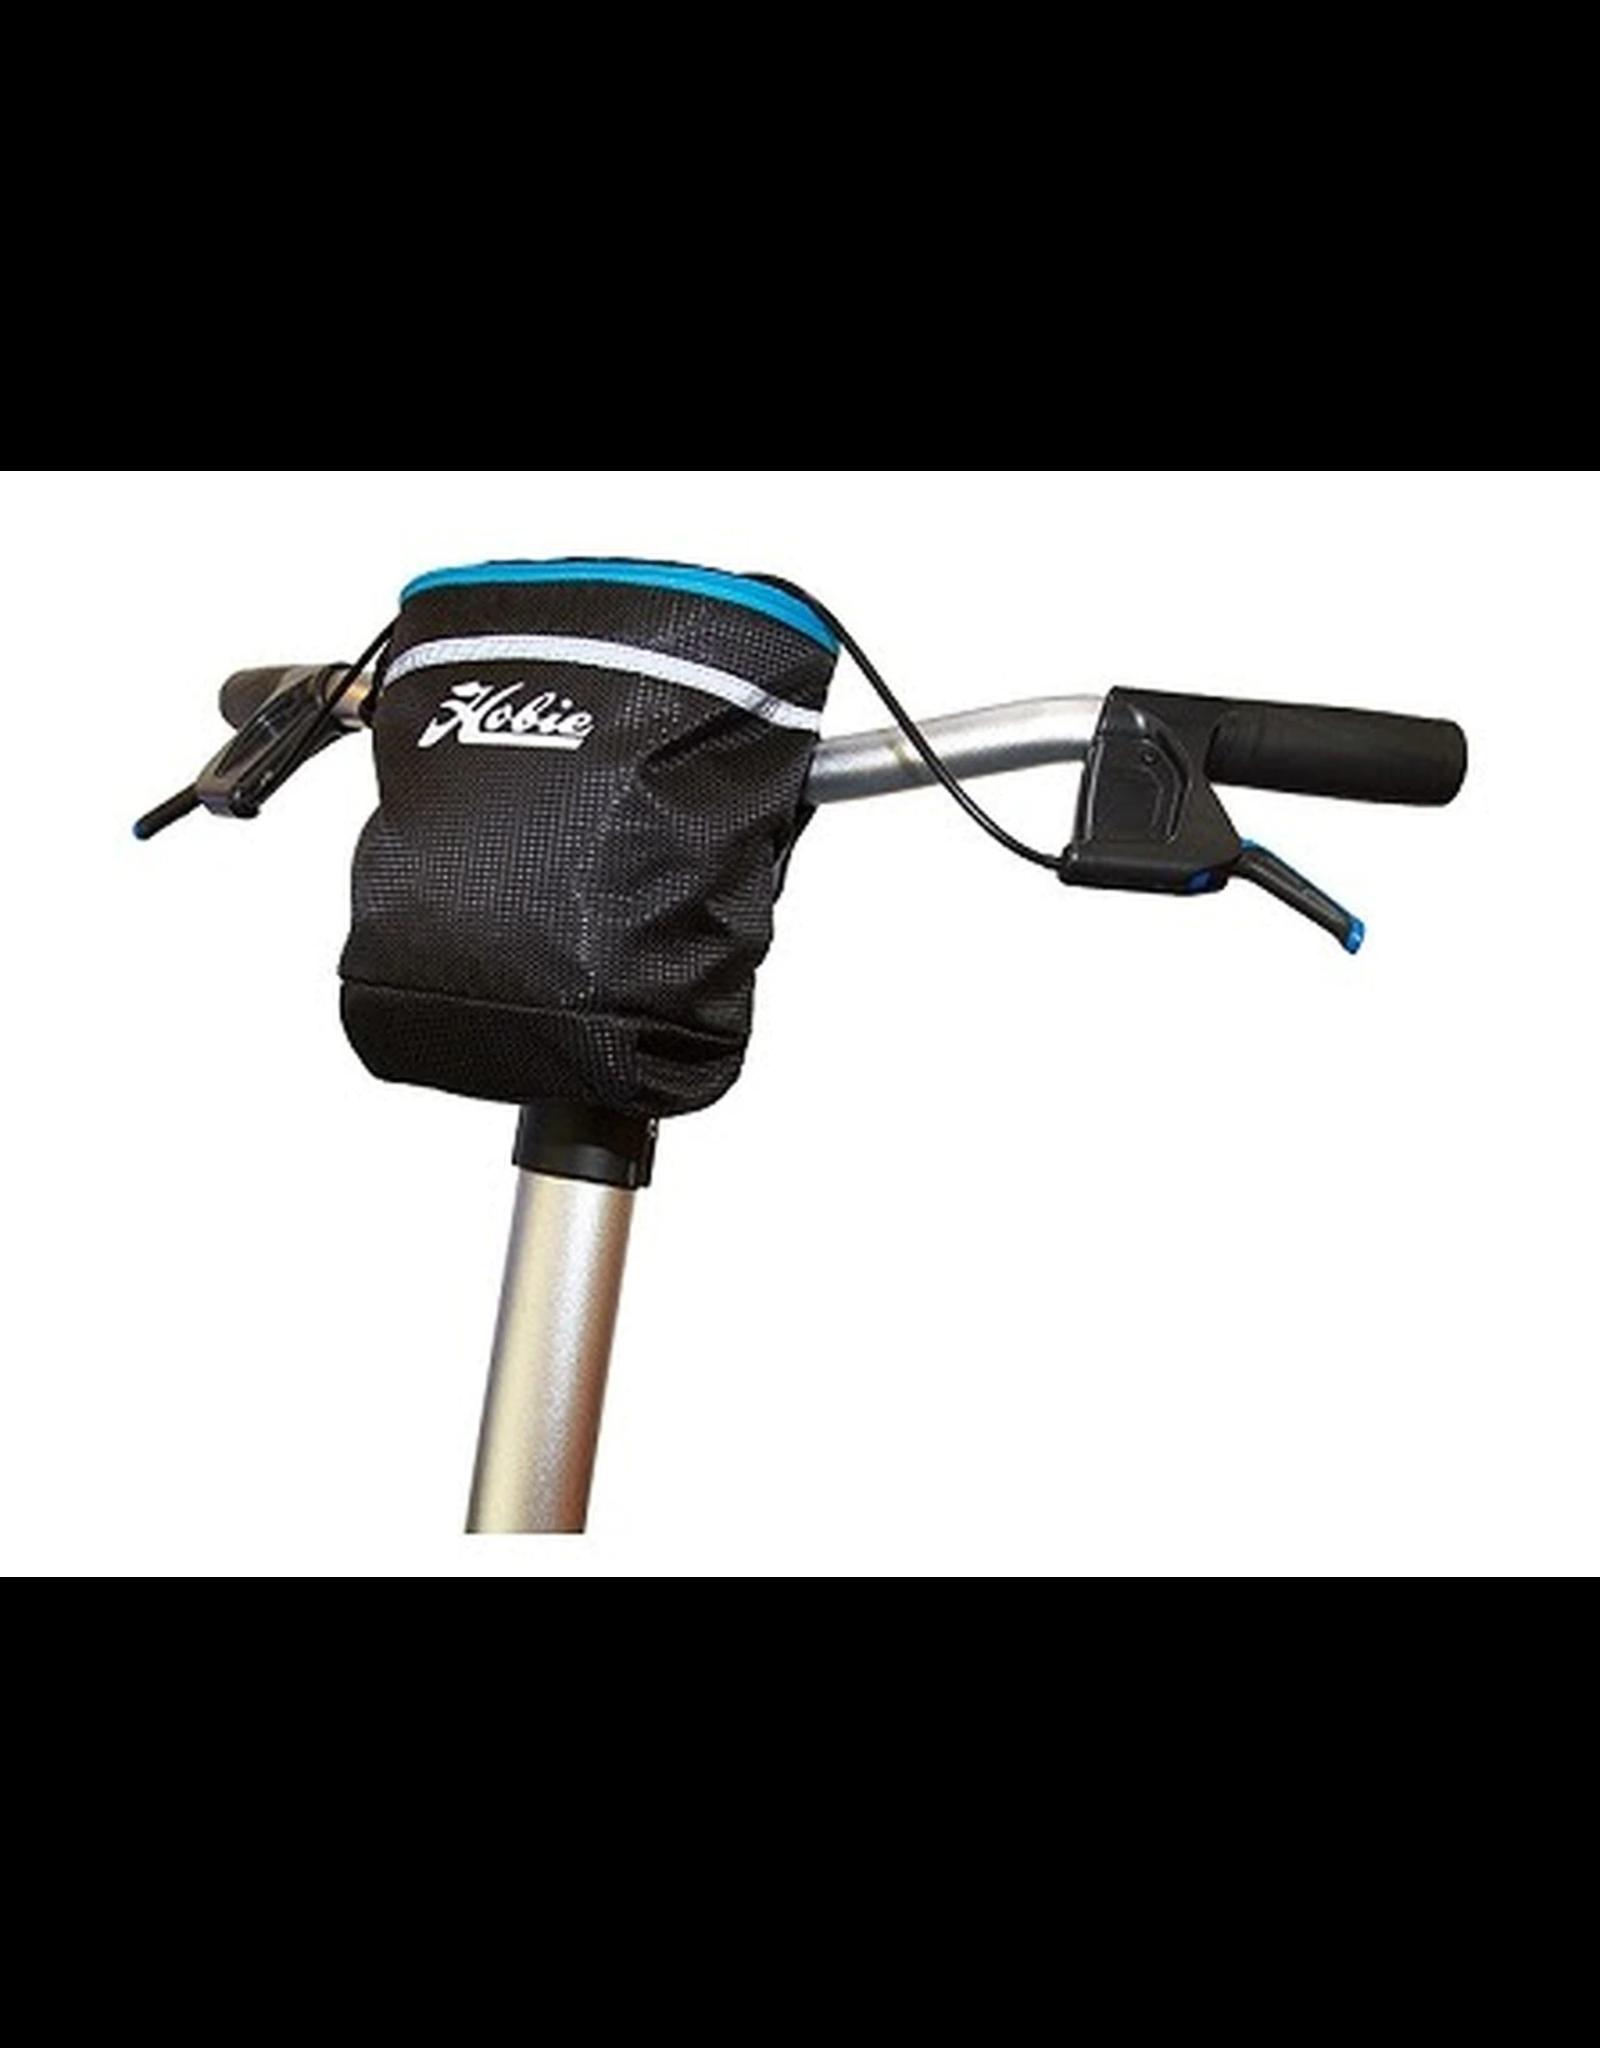 Hobie Hobie Acc. Eclipse Sac Guidon - Eclipse Accessory Bag